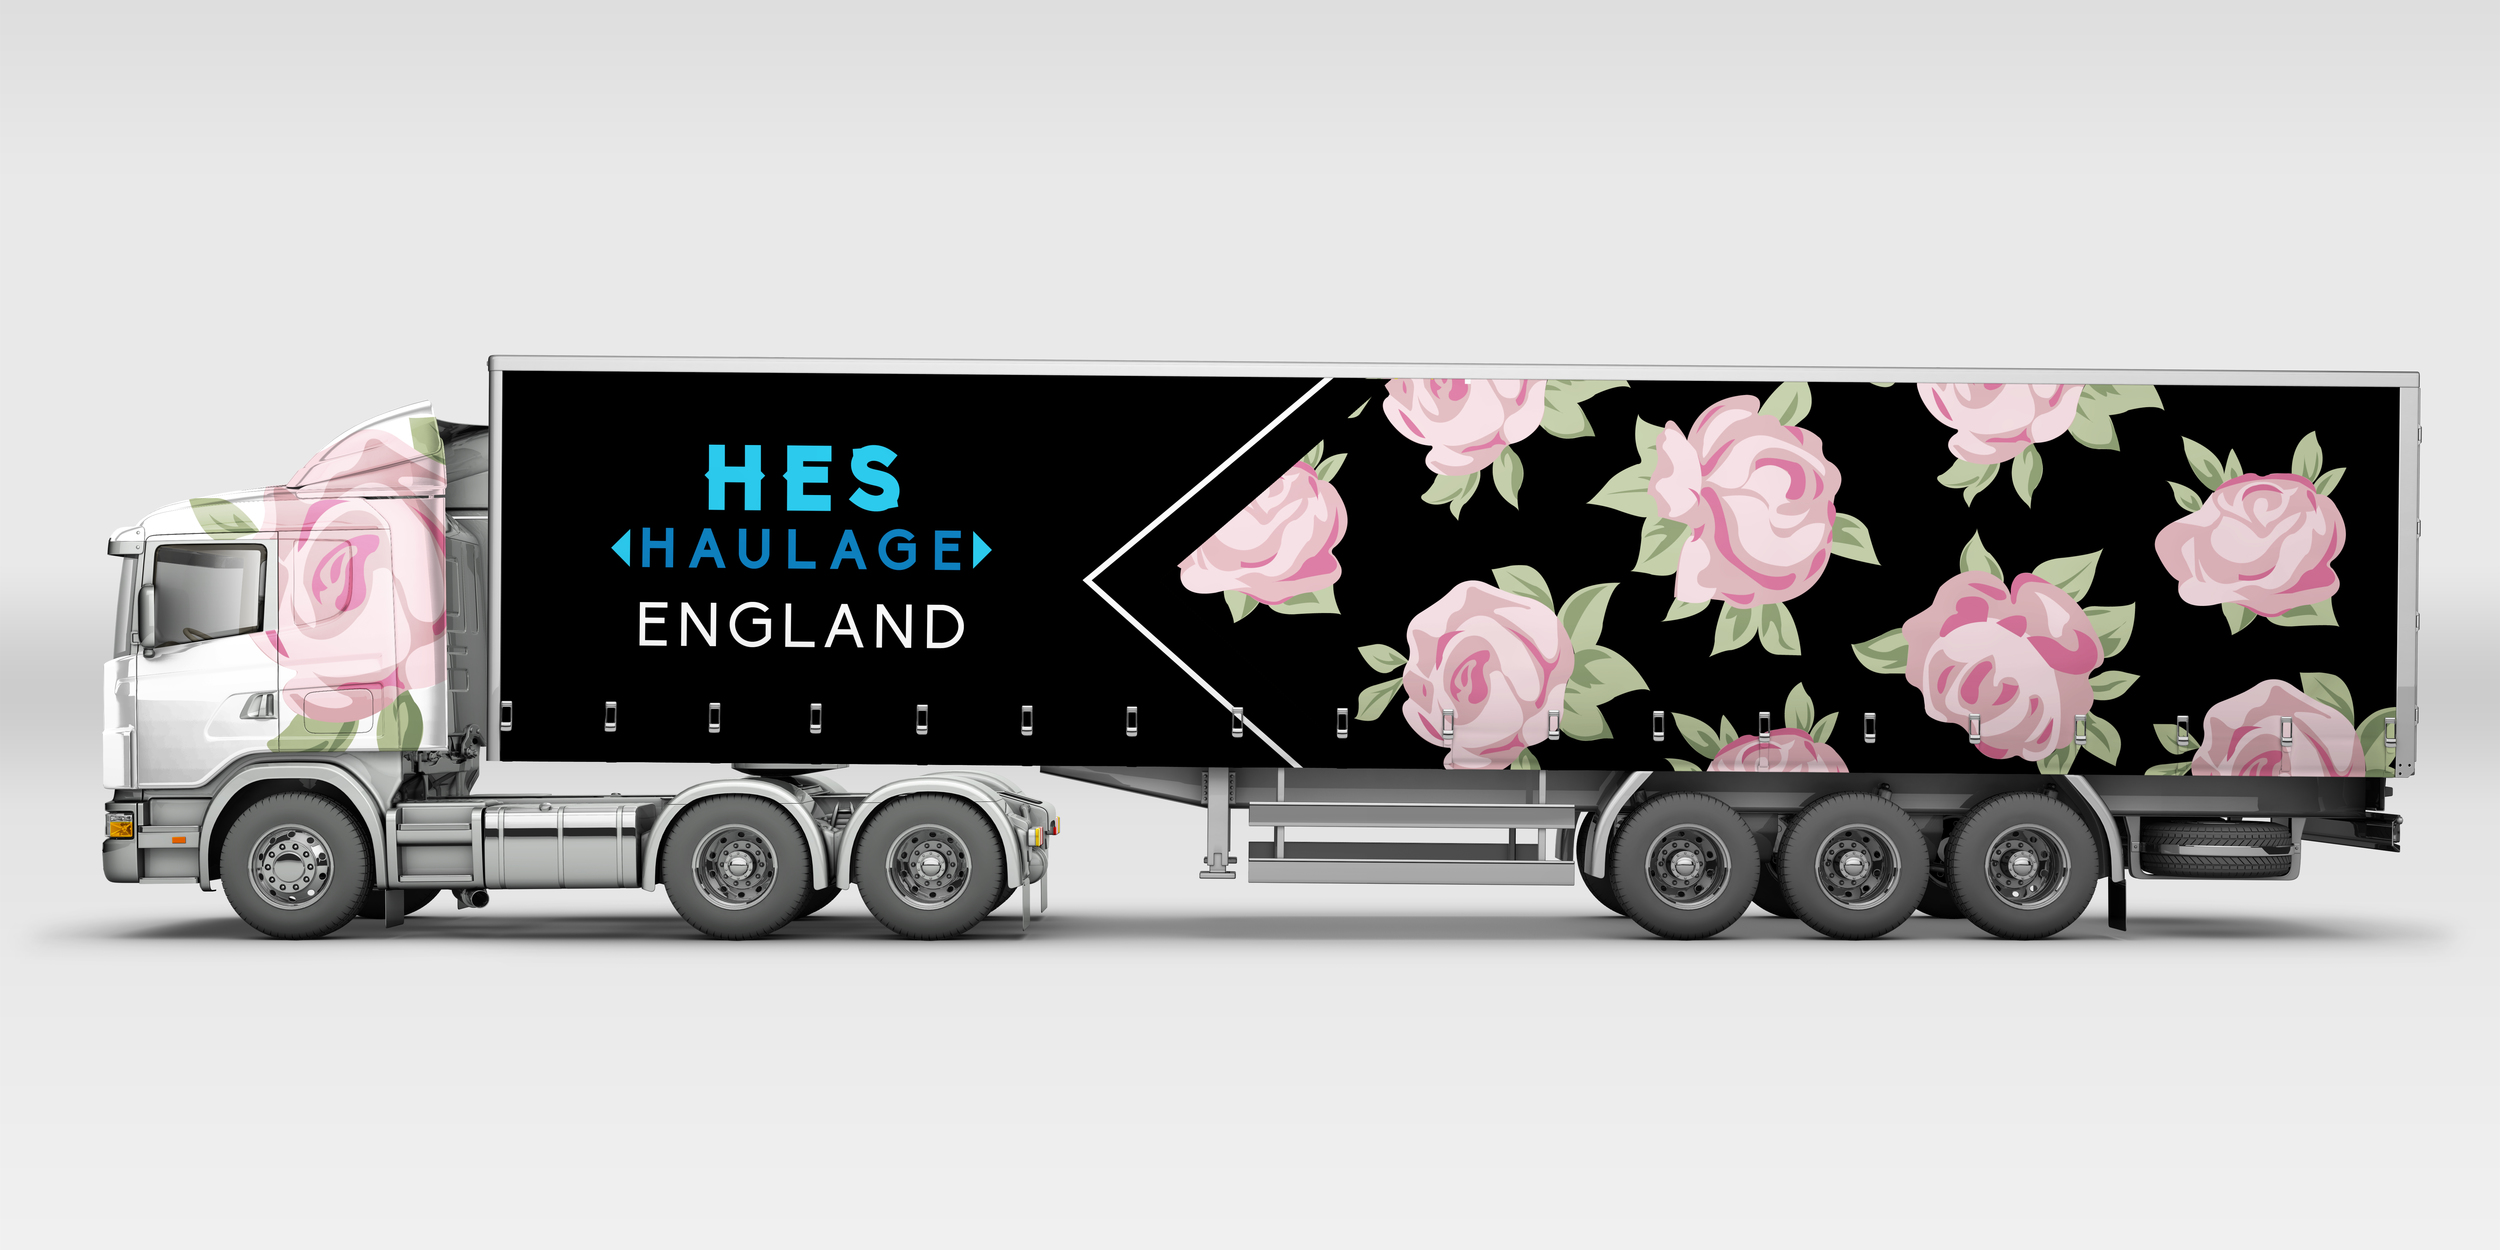 Haulage-England.jpg